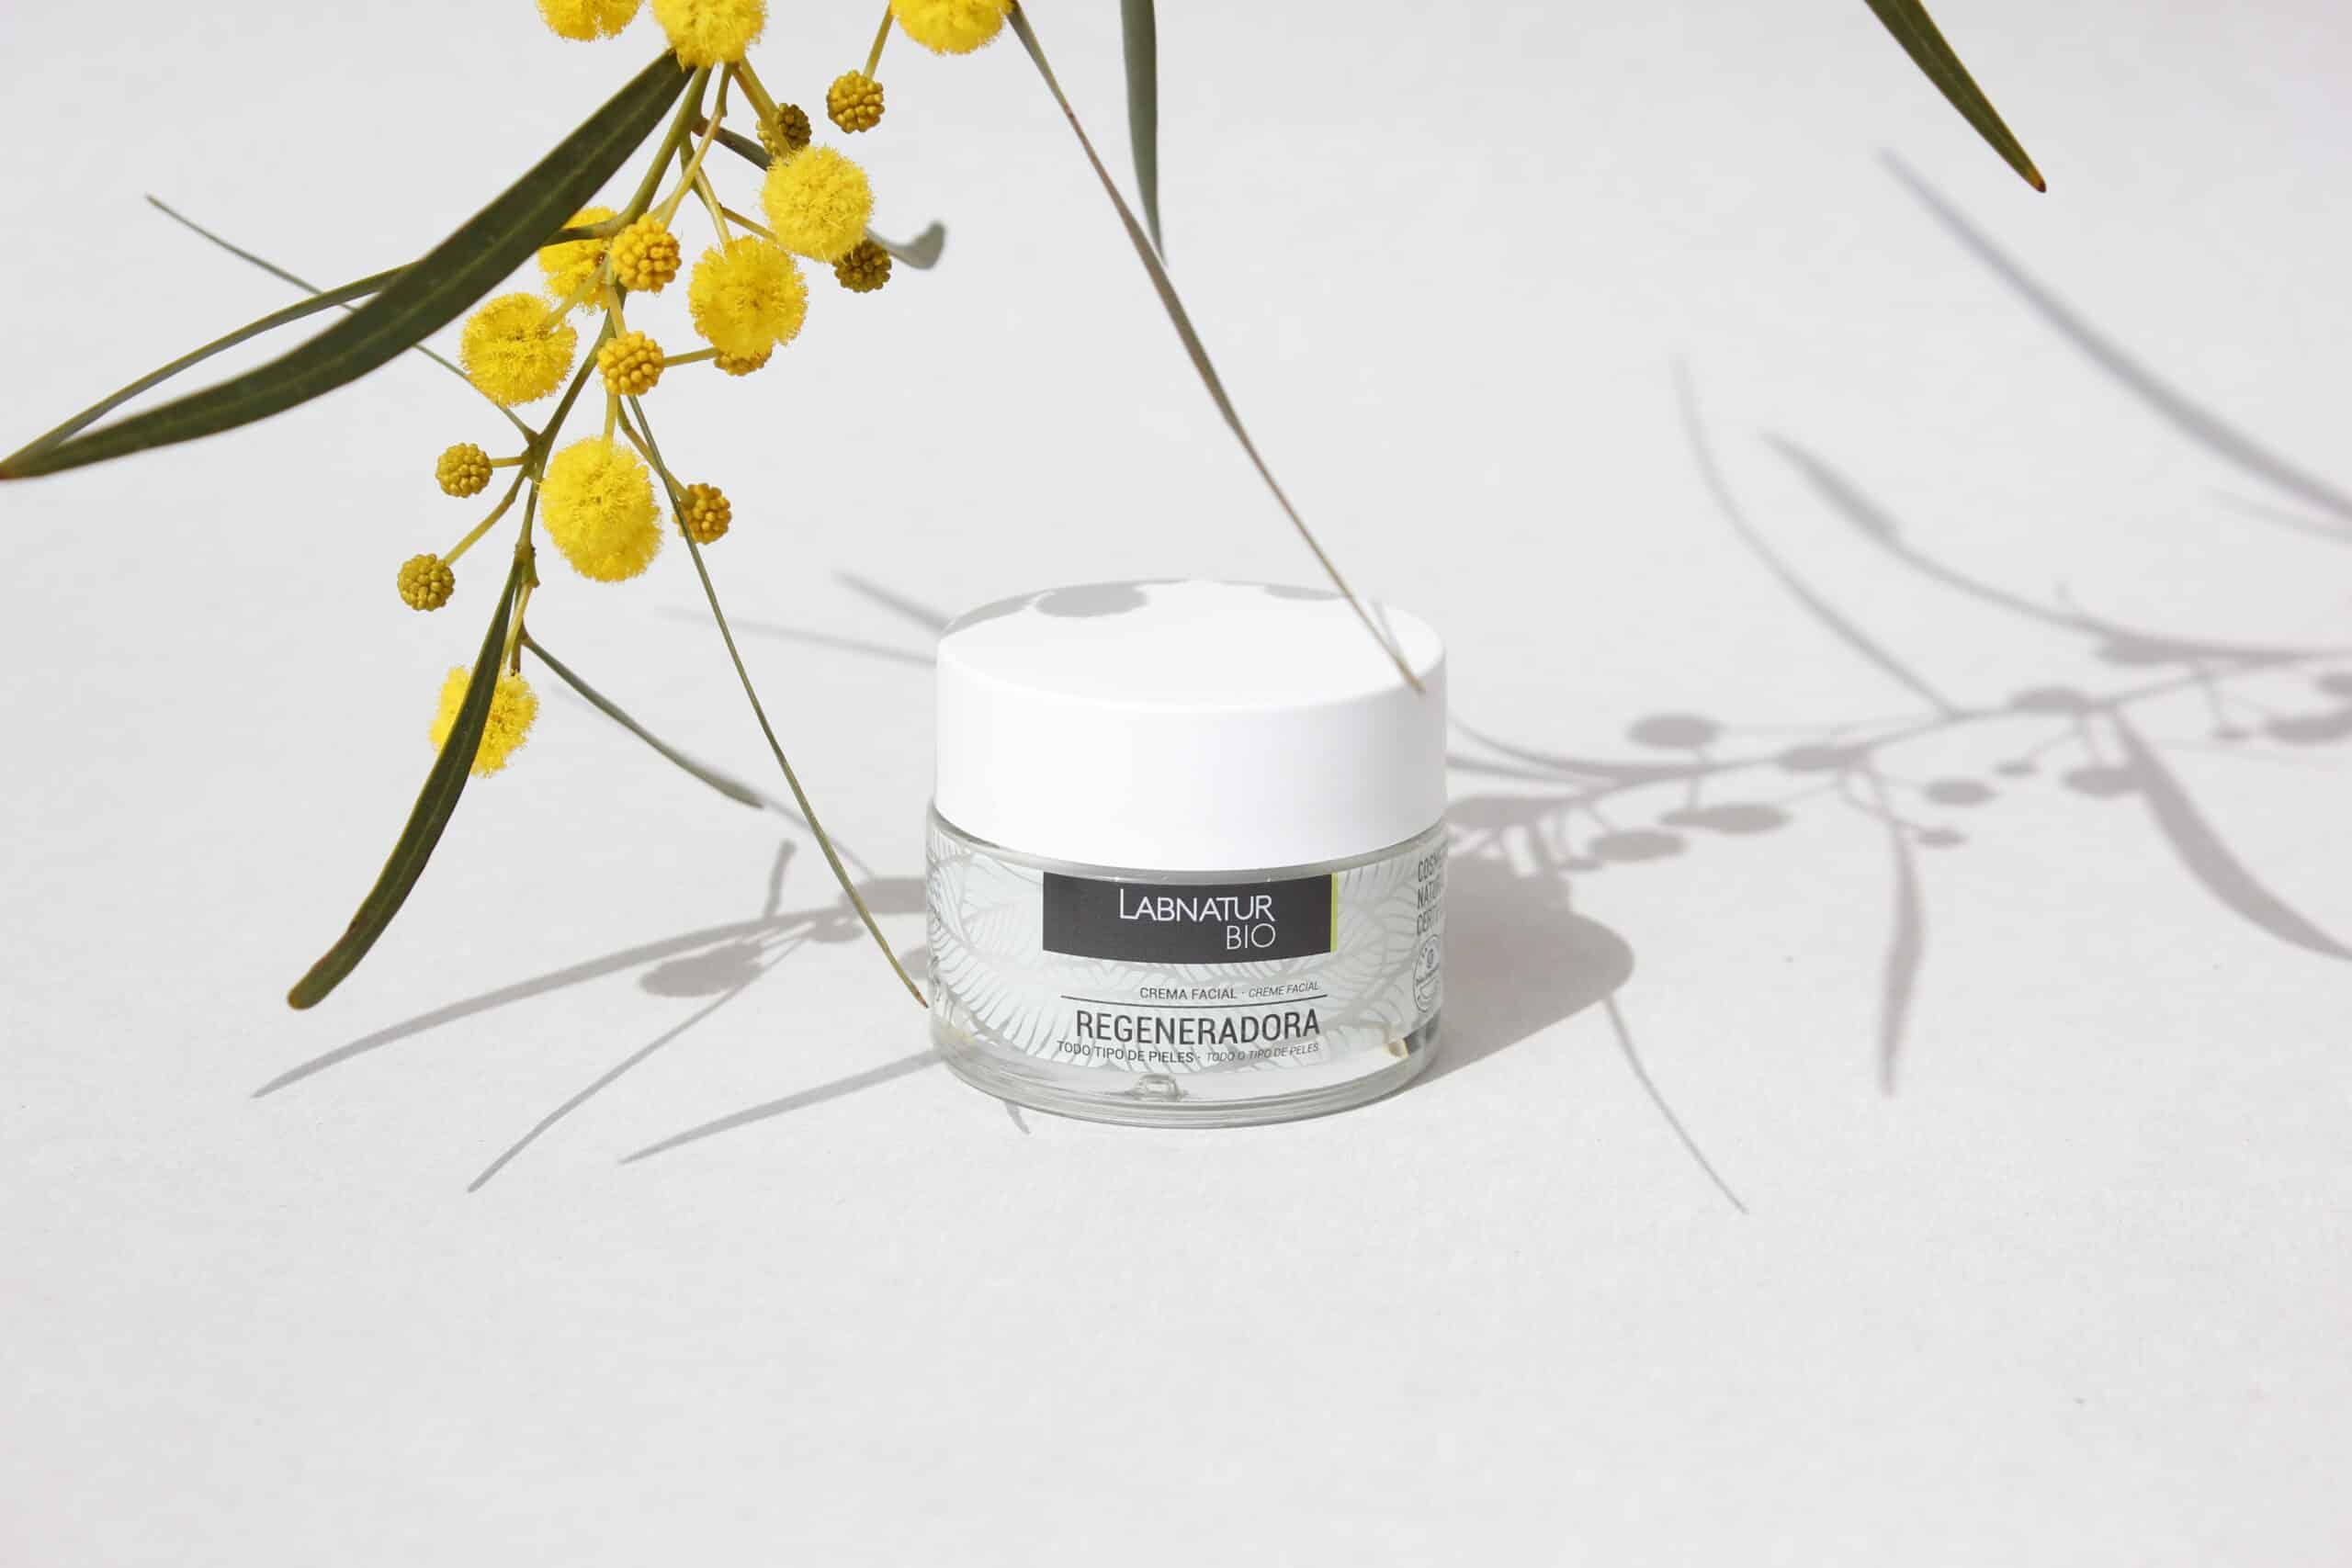 Labnatur Bio Crema Facial Regeneradora